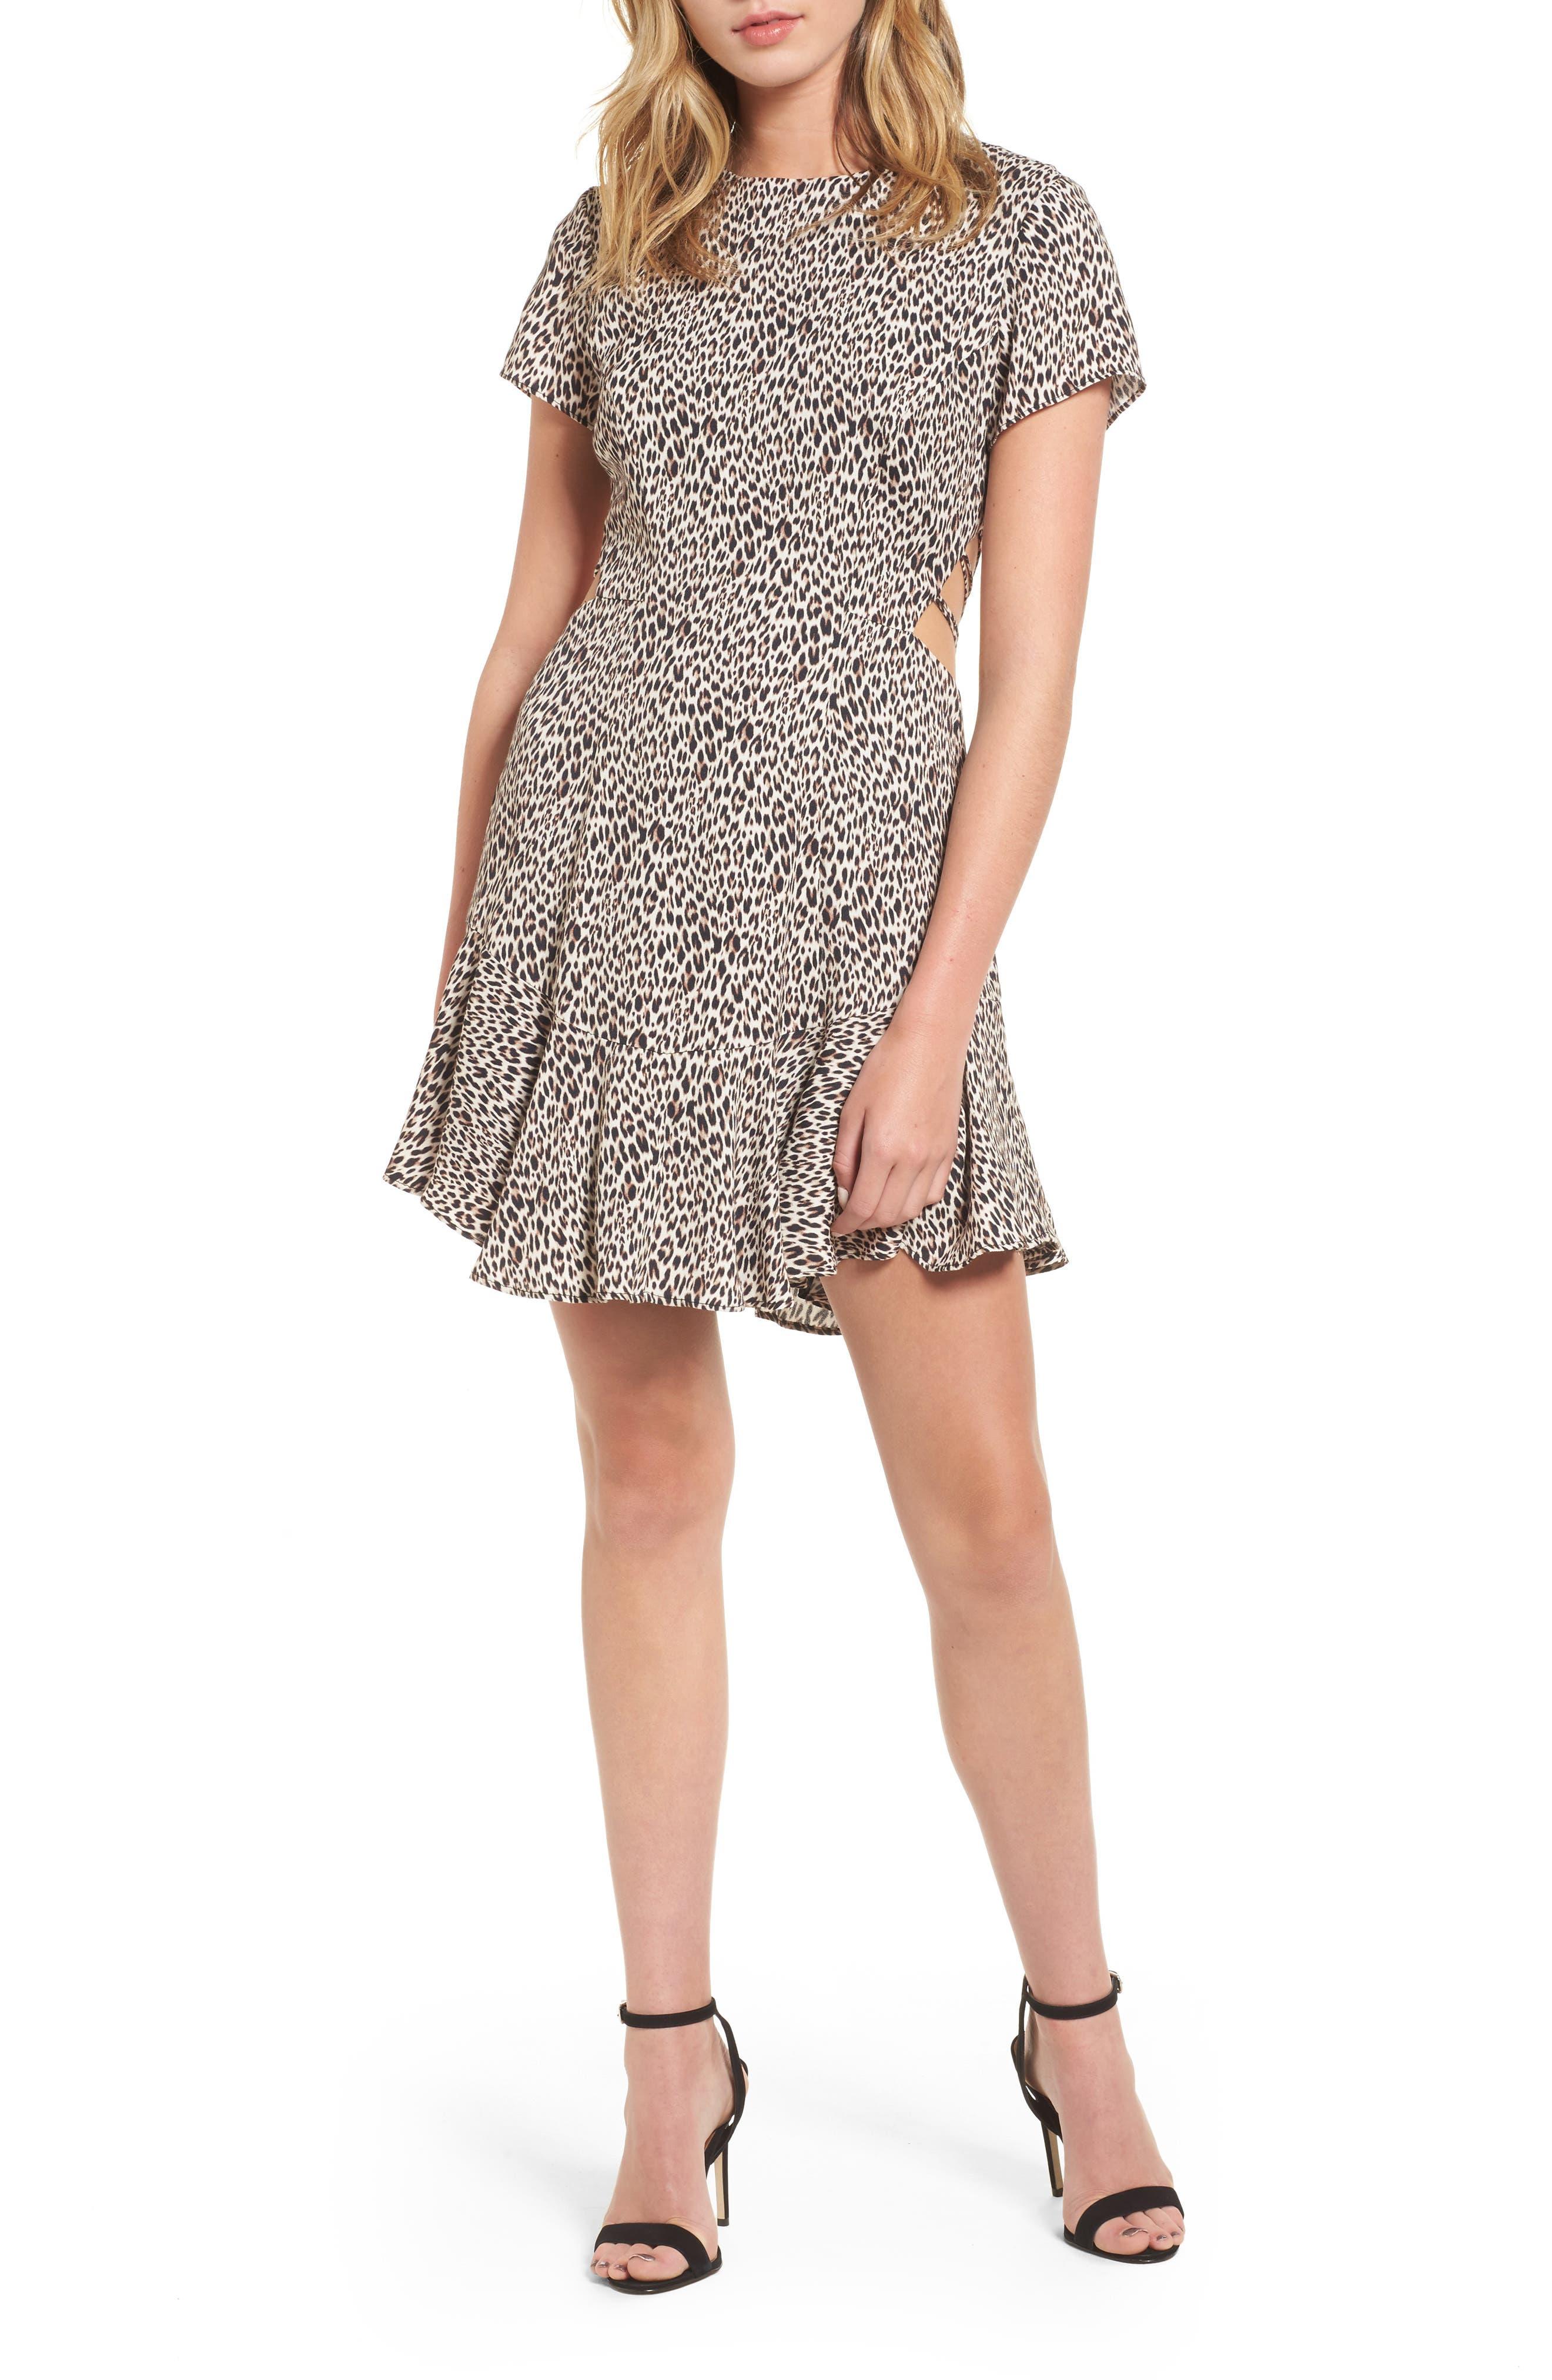 ARRIVE Chelsea Lattice Back Fit & Flare Dress